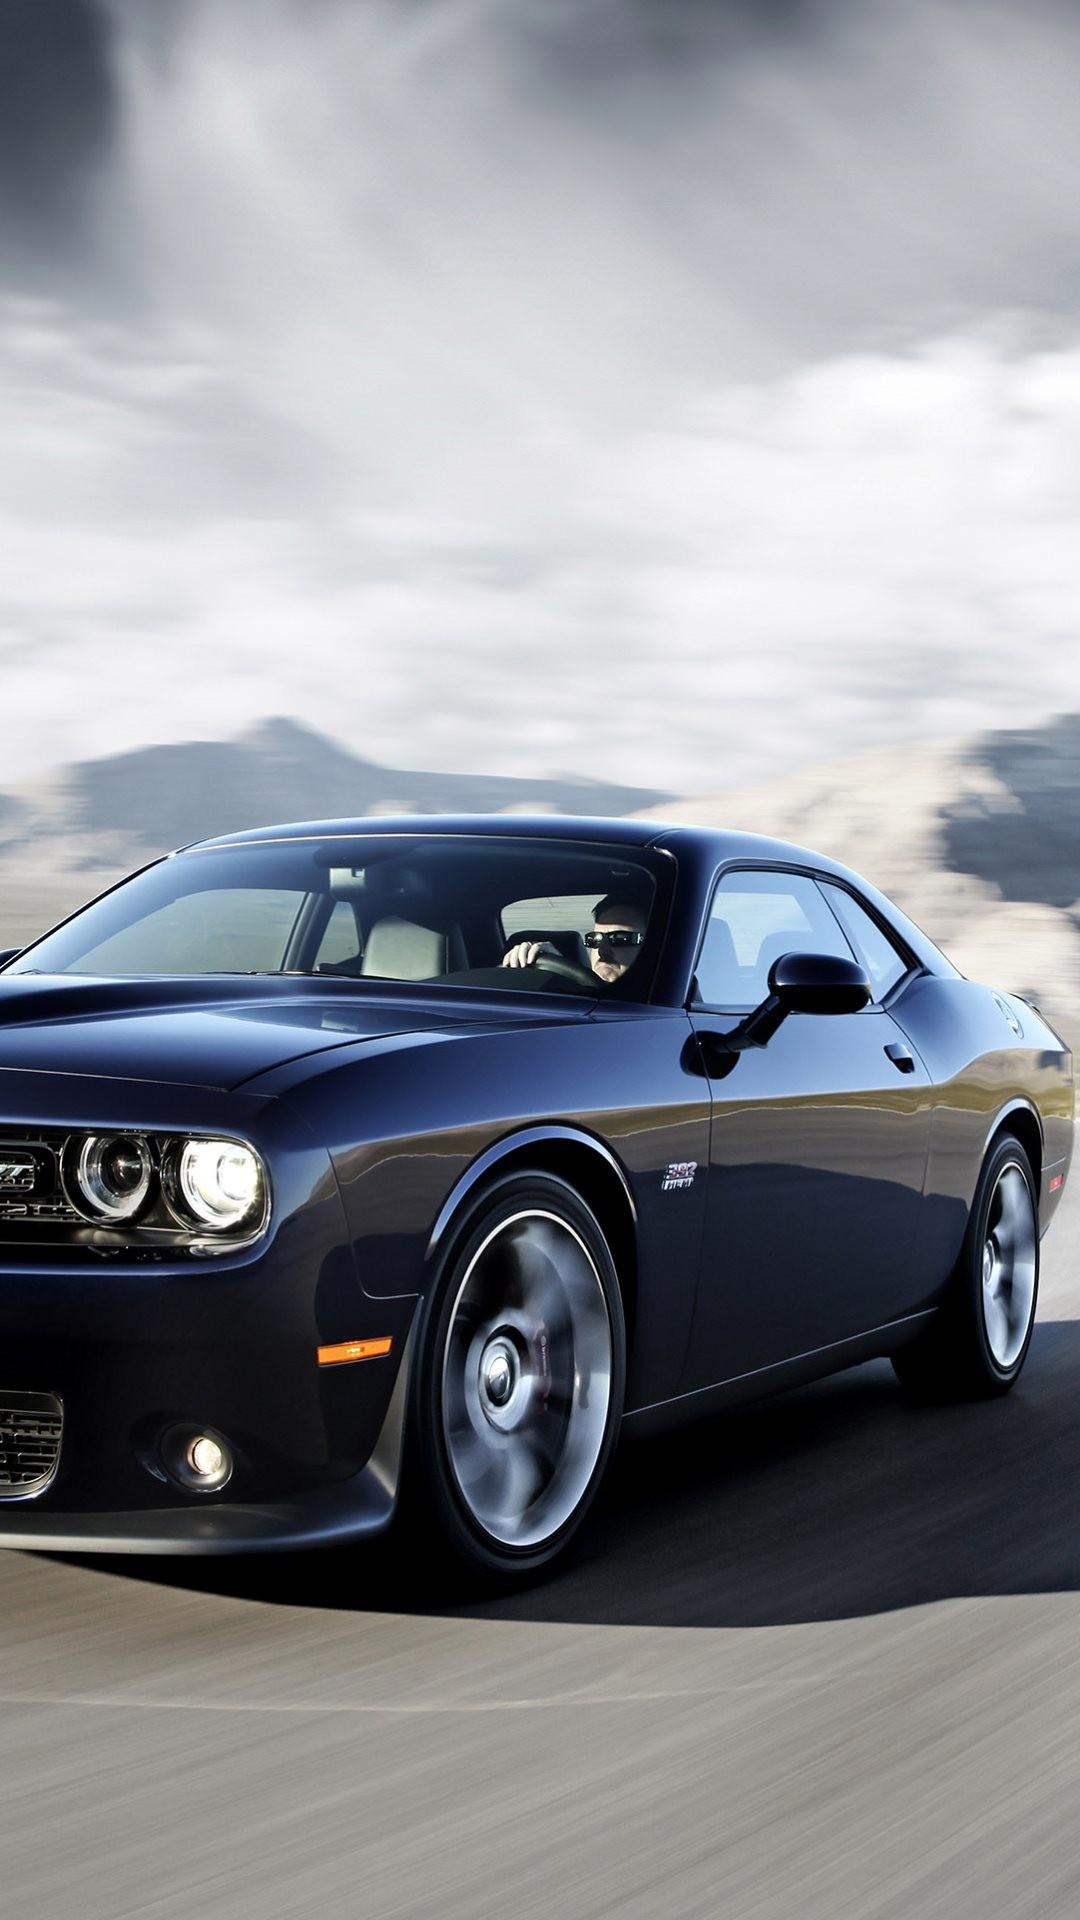 Dodge Challenger SRT Hellcat 2015 Wallpapers :: HD Wallpapers